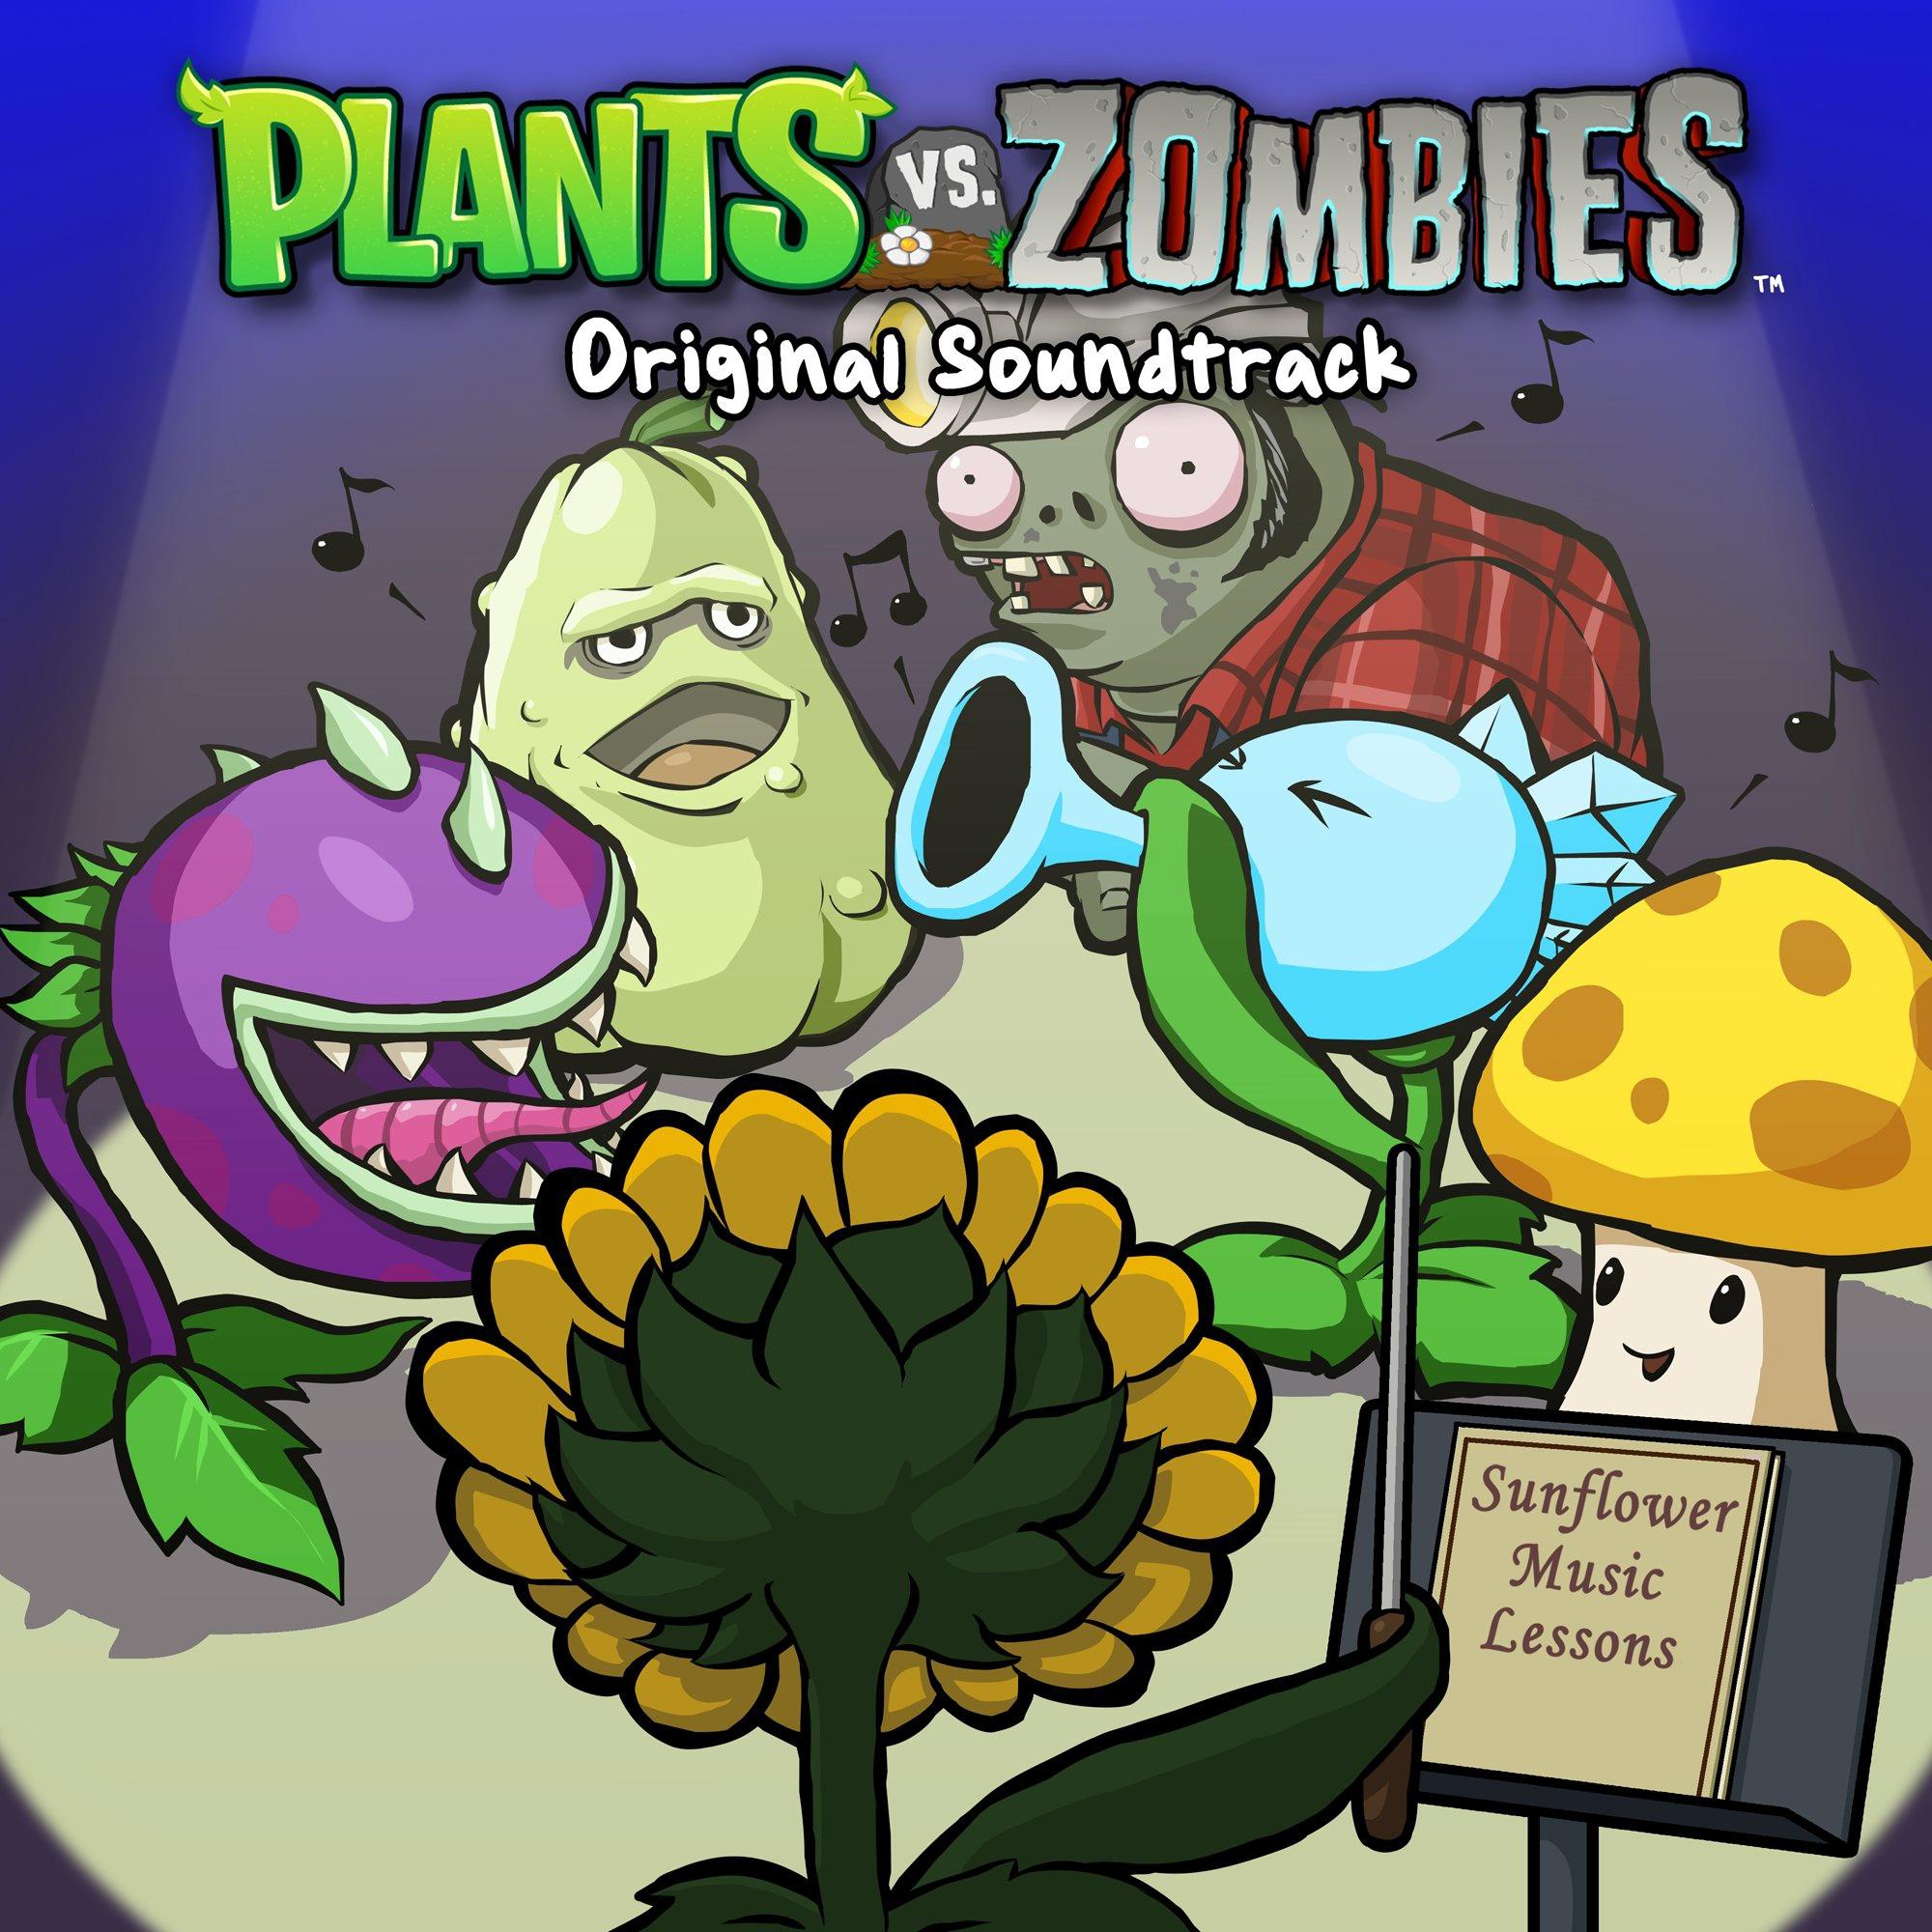 Laura Shigihara album Plants vs. Zombies Original Soundtrack